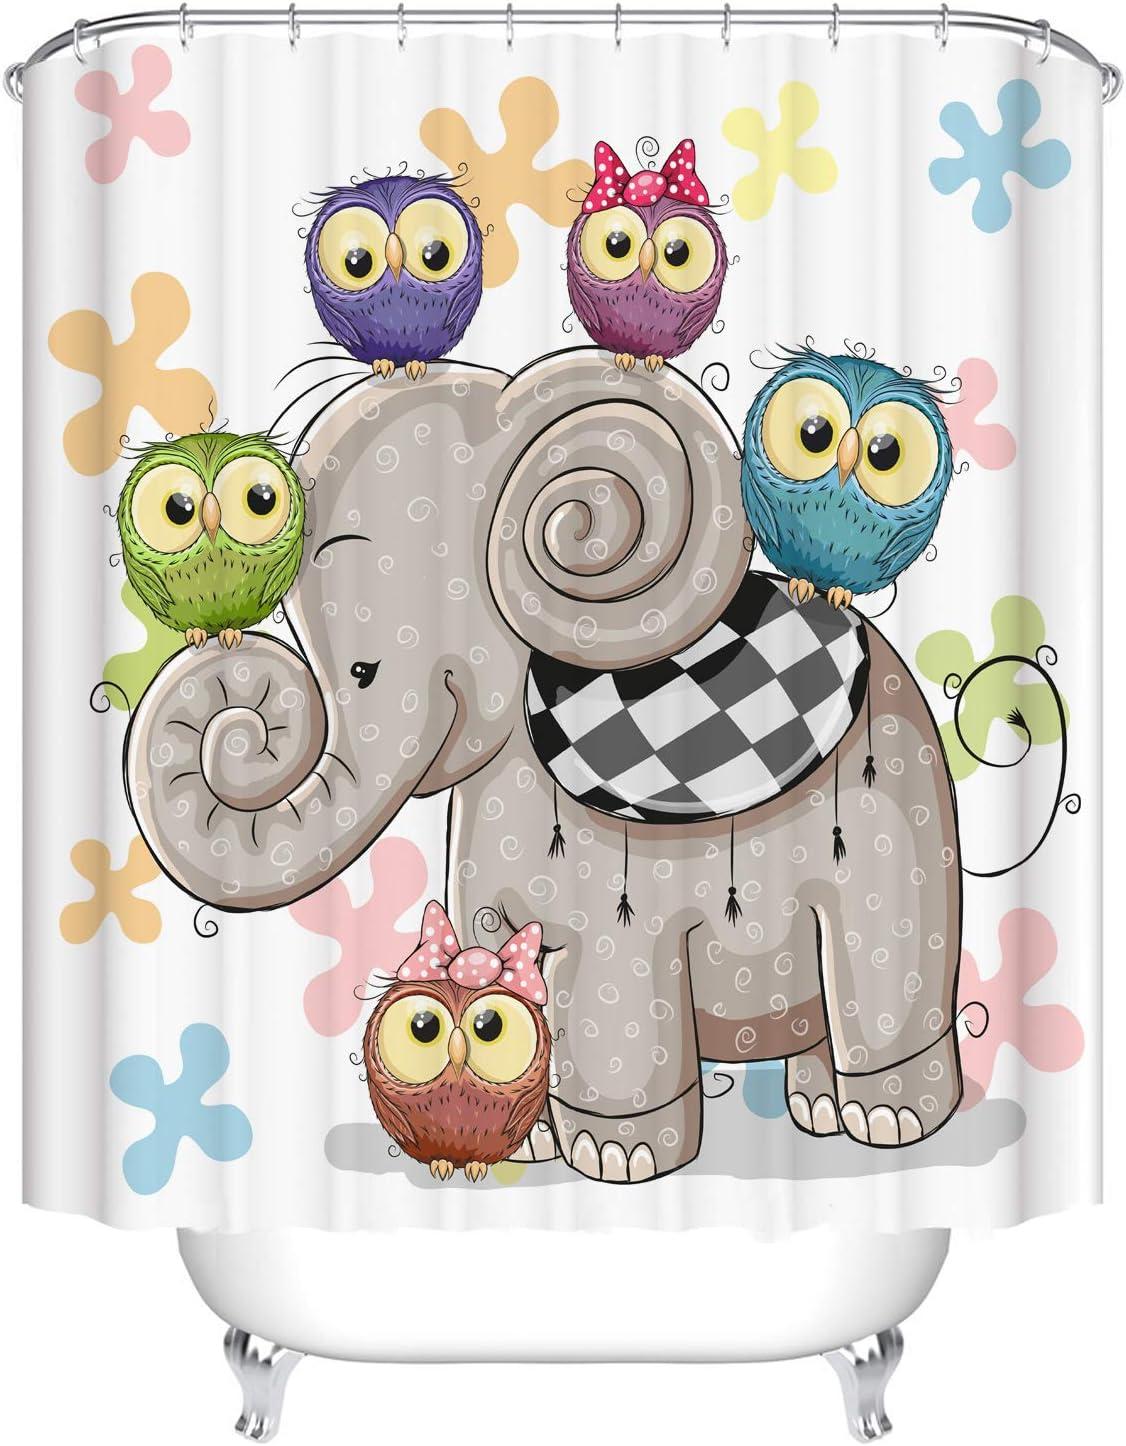 Dodou Cartoon Animal Shower Curtain Art Bathroom Decor Cute owl and Elephant Design Polyester Waterproof Fabric Bathroom Accessories with Hooks (72''Wx72''H)